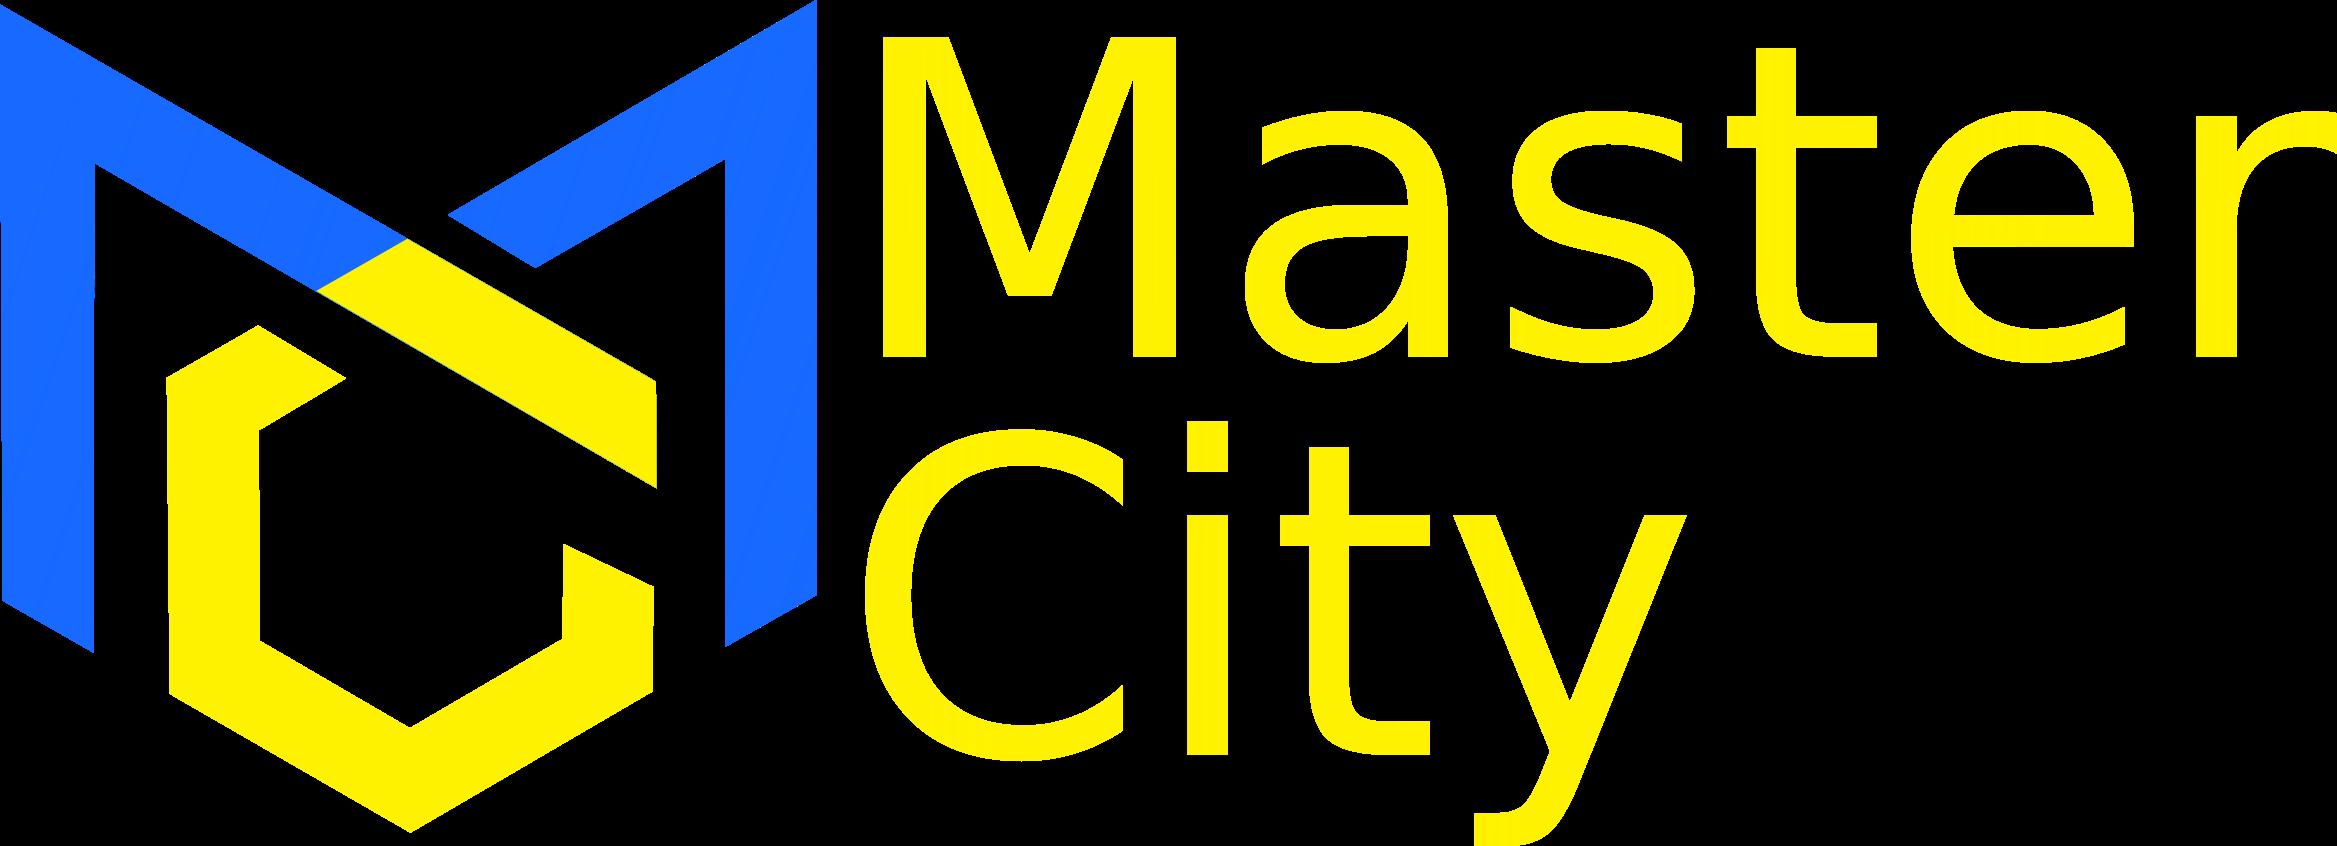 MasterCity